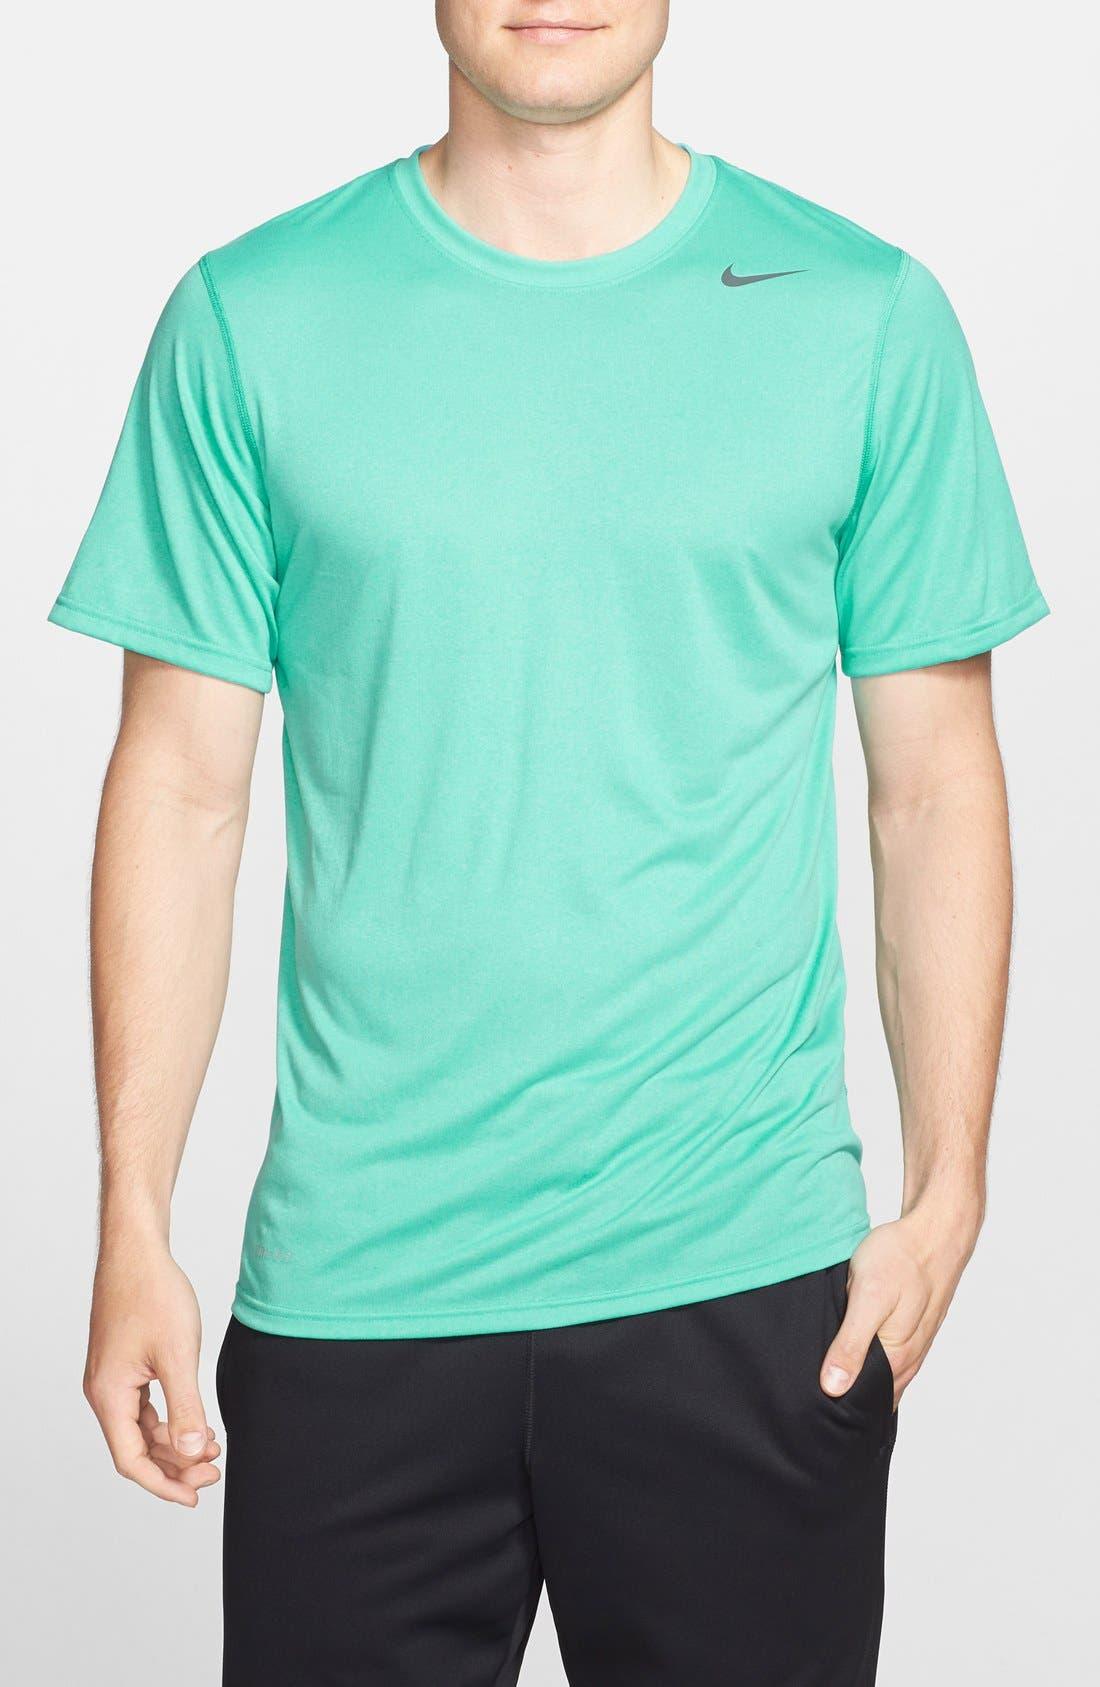 Alternate Image 1 Selected - Nike 'Legends' Dri-FIT T-Shirt